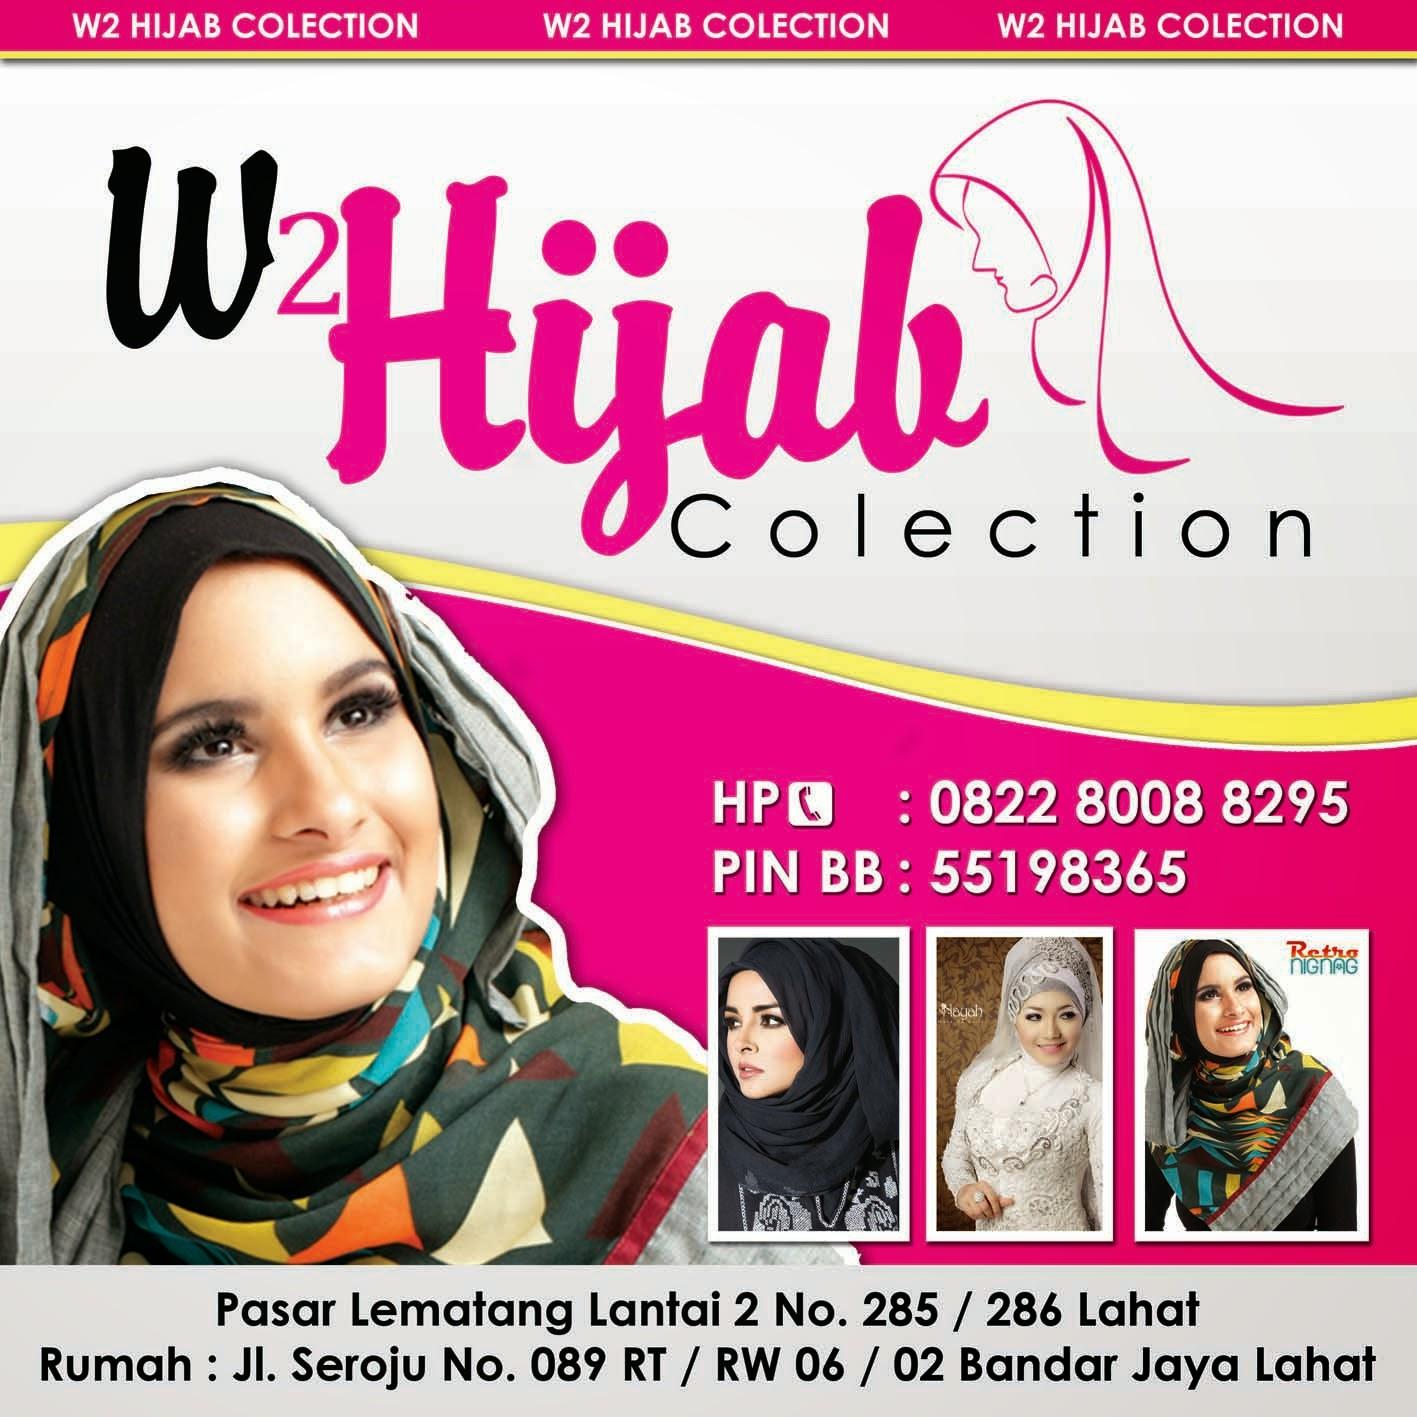 Desain Banner Hijab - Quotes 8 b